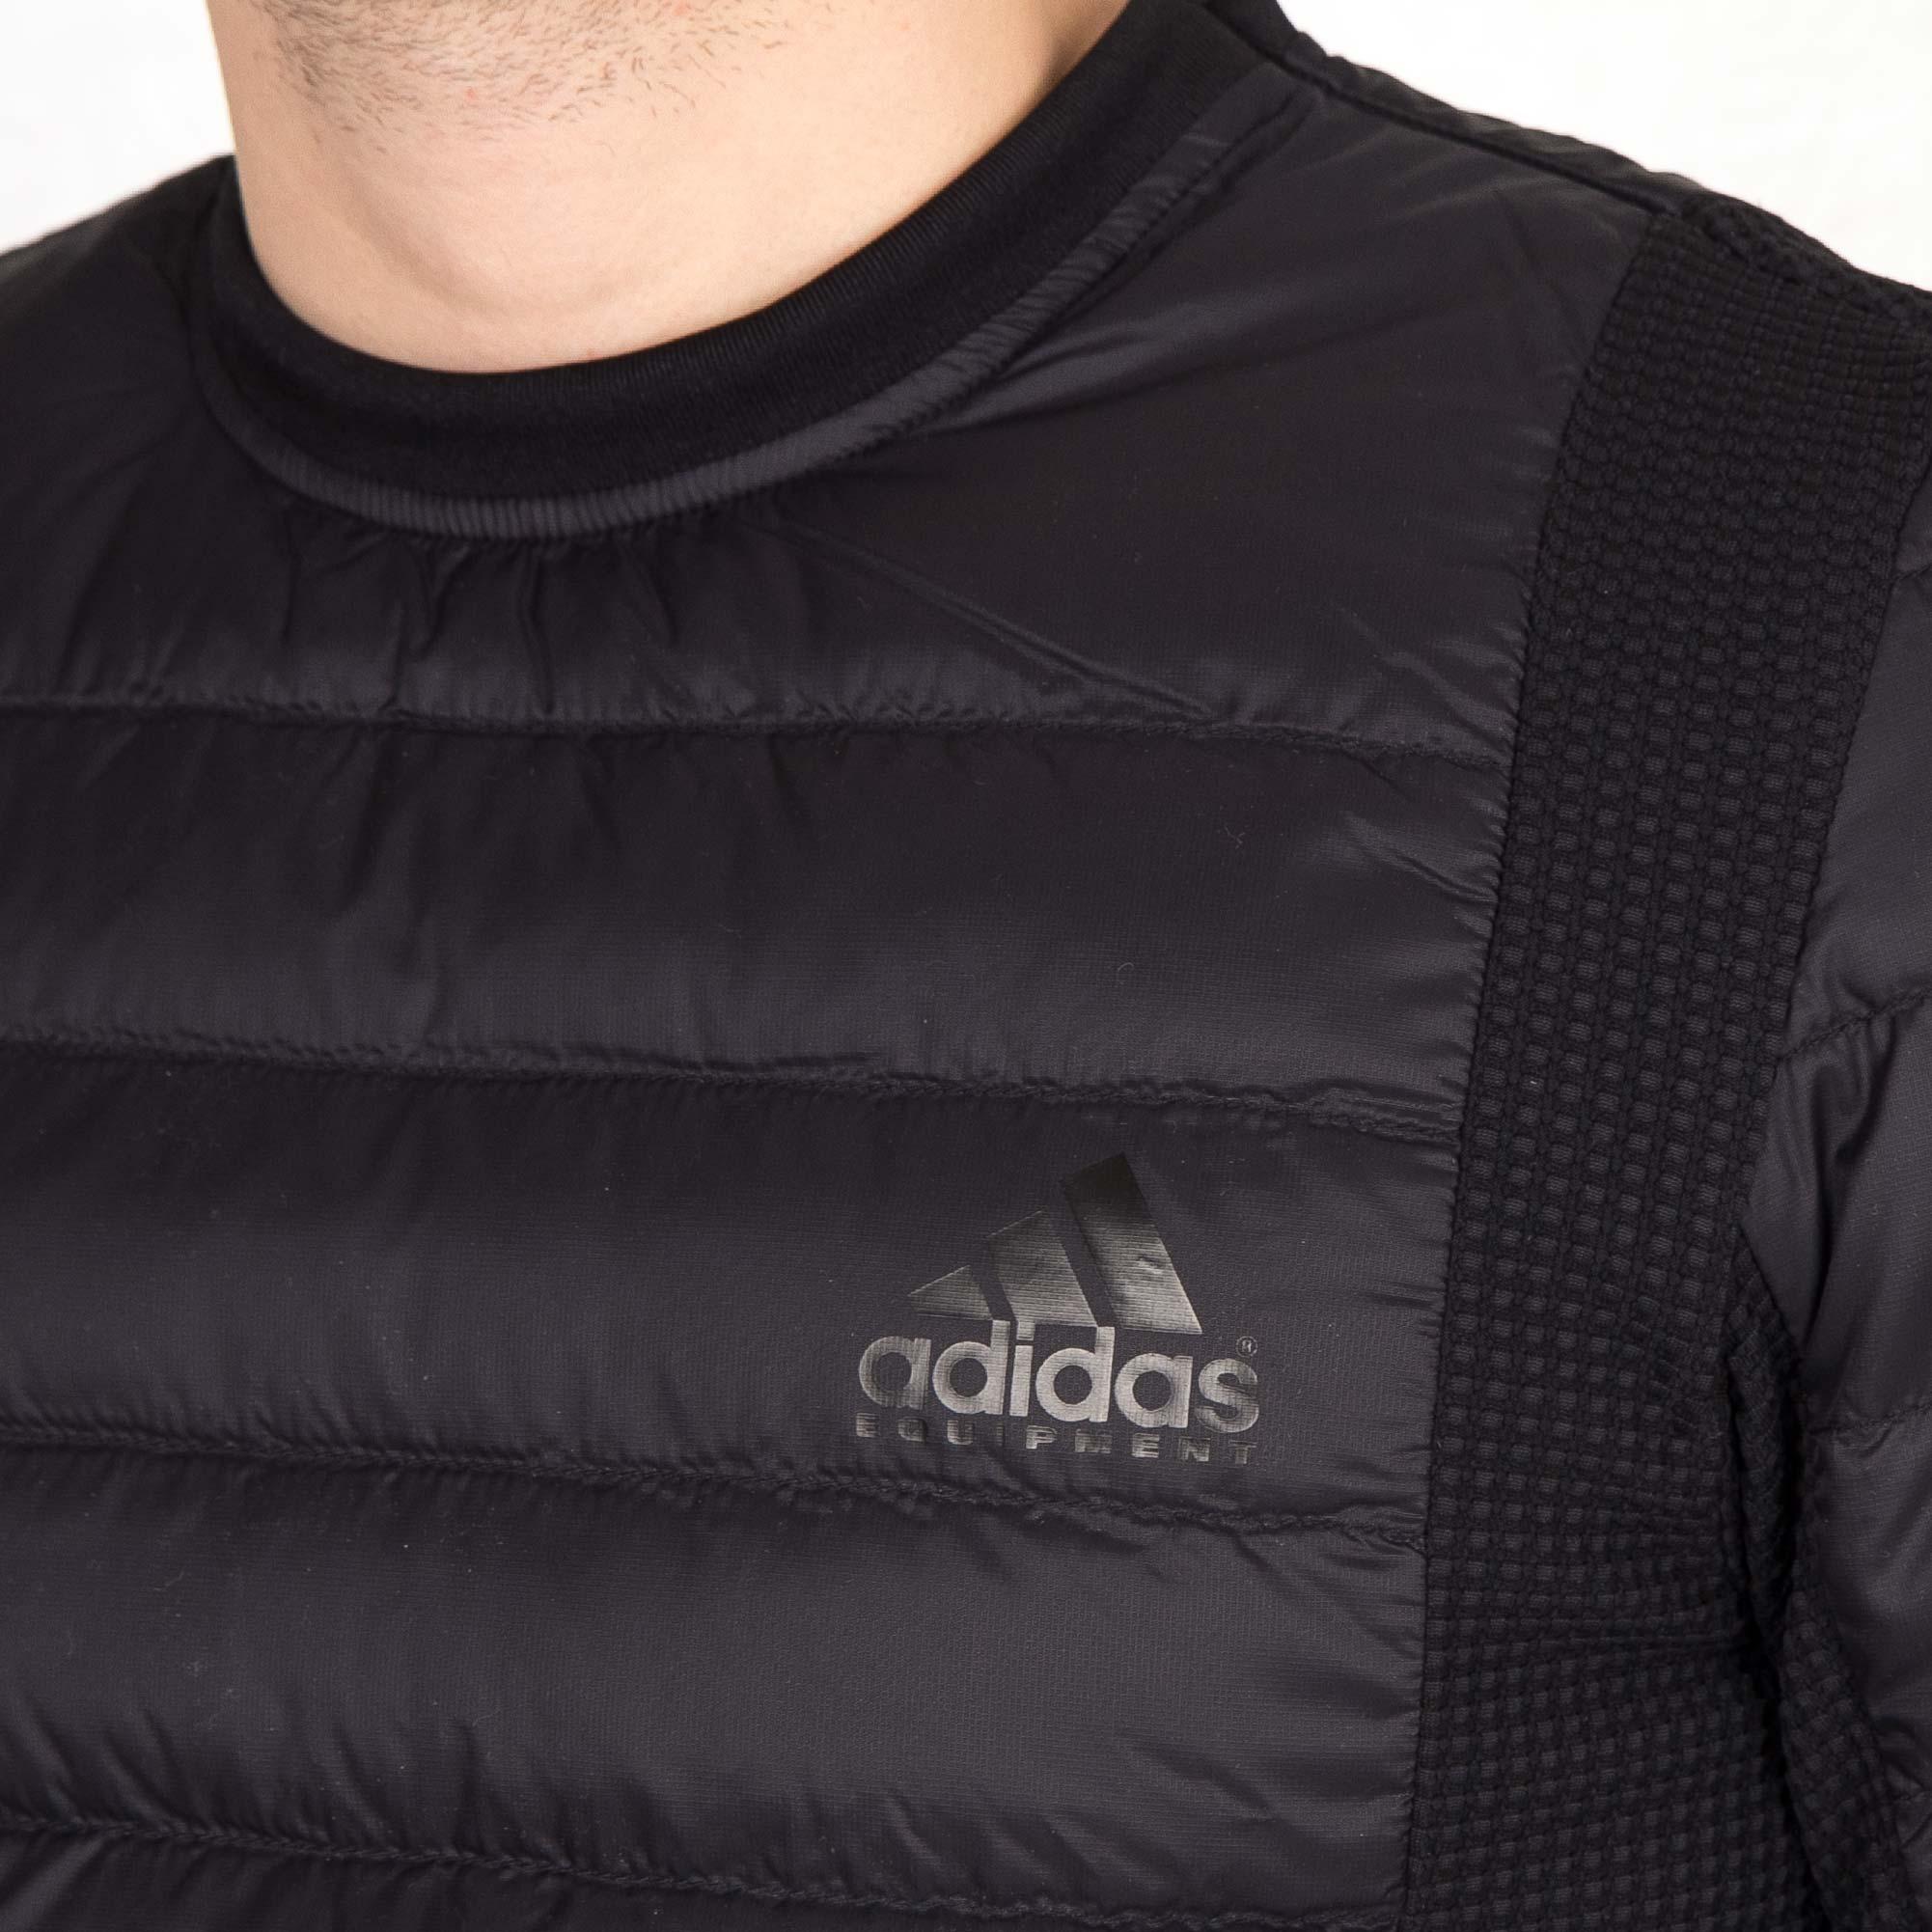 Adidas Hoodies & Sweatshirts Eqt Tech Down Crew Sweatshirt